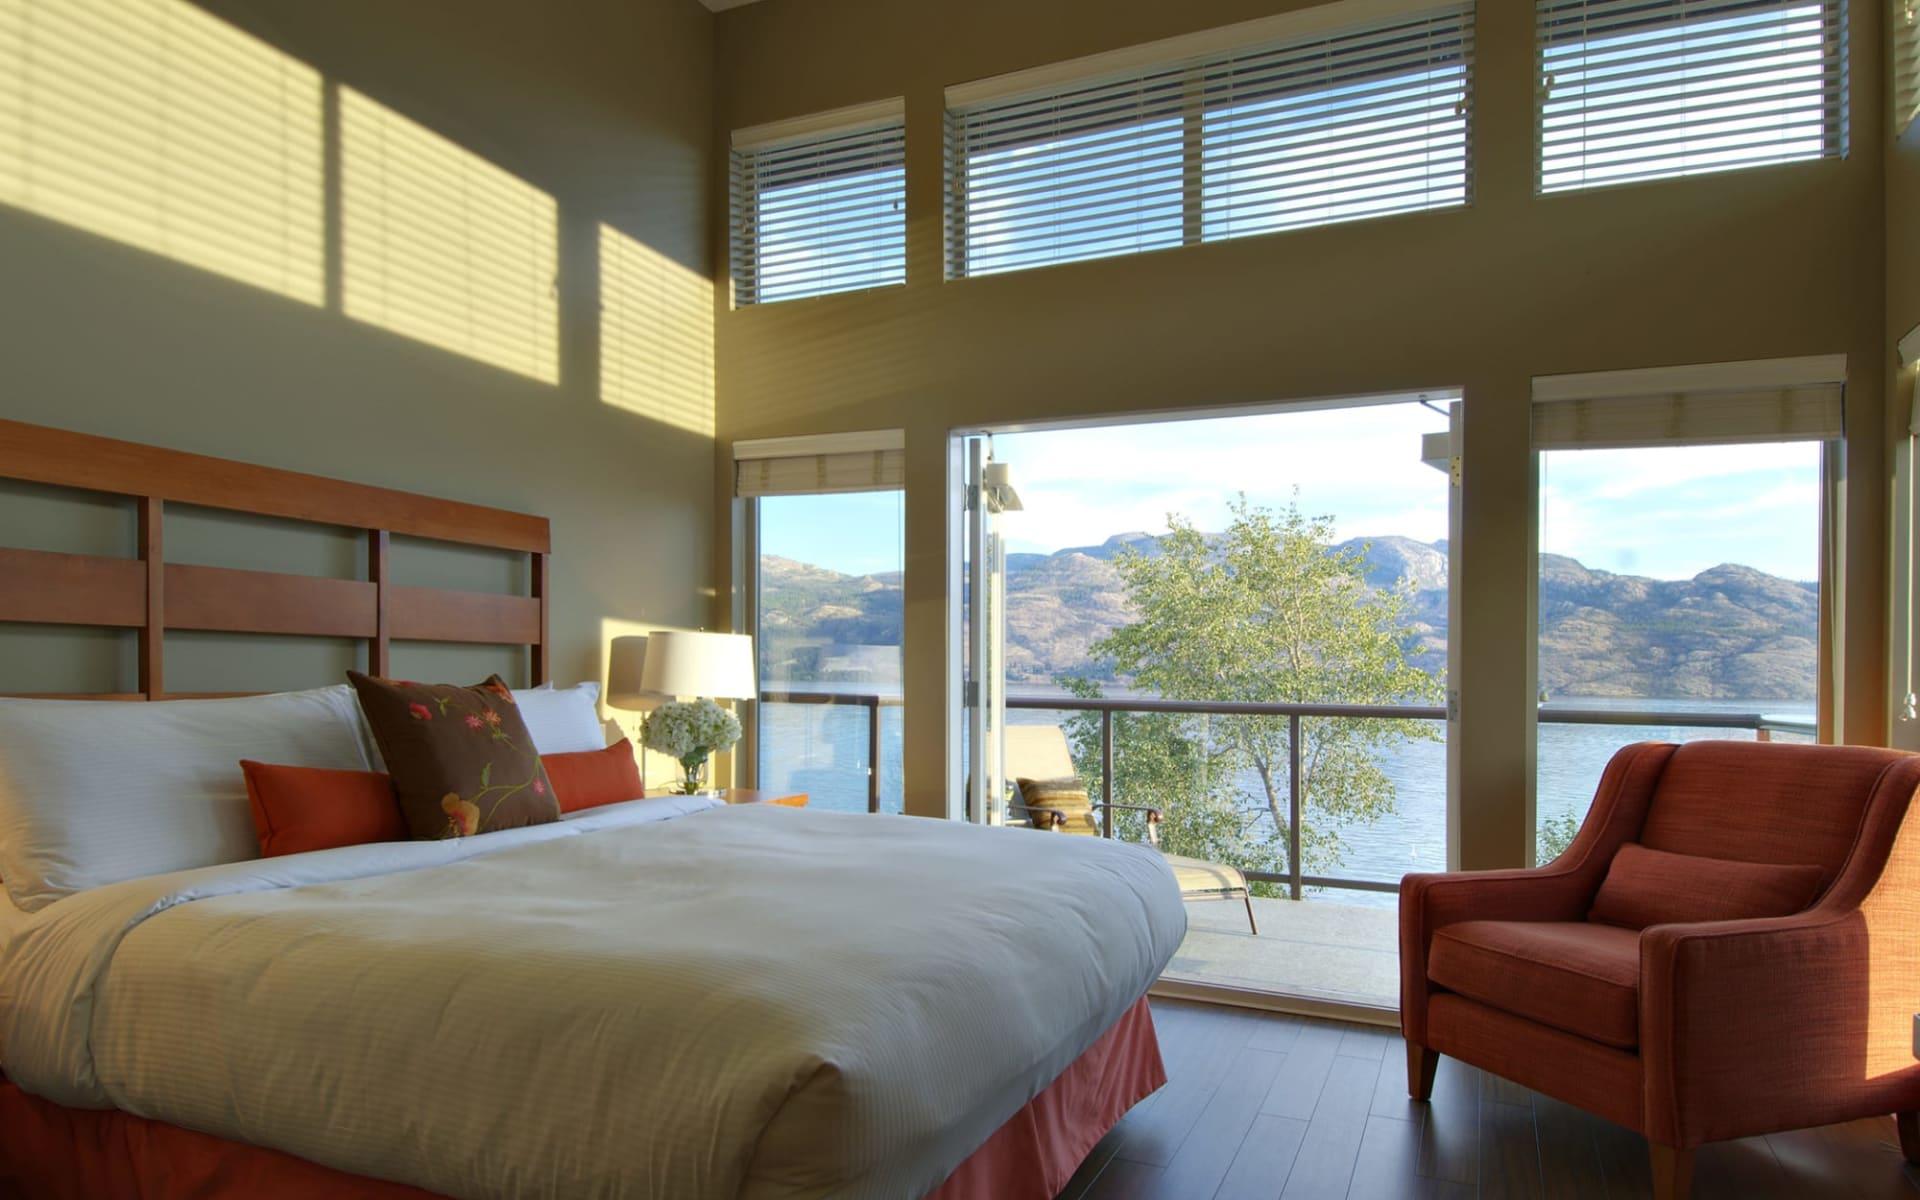 The Cove Lakeside Resort in Kelowna:  YWBCB_room_003